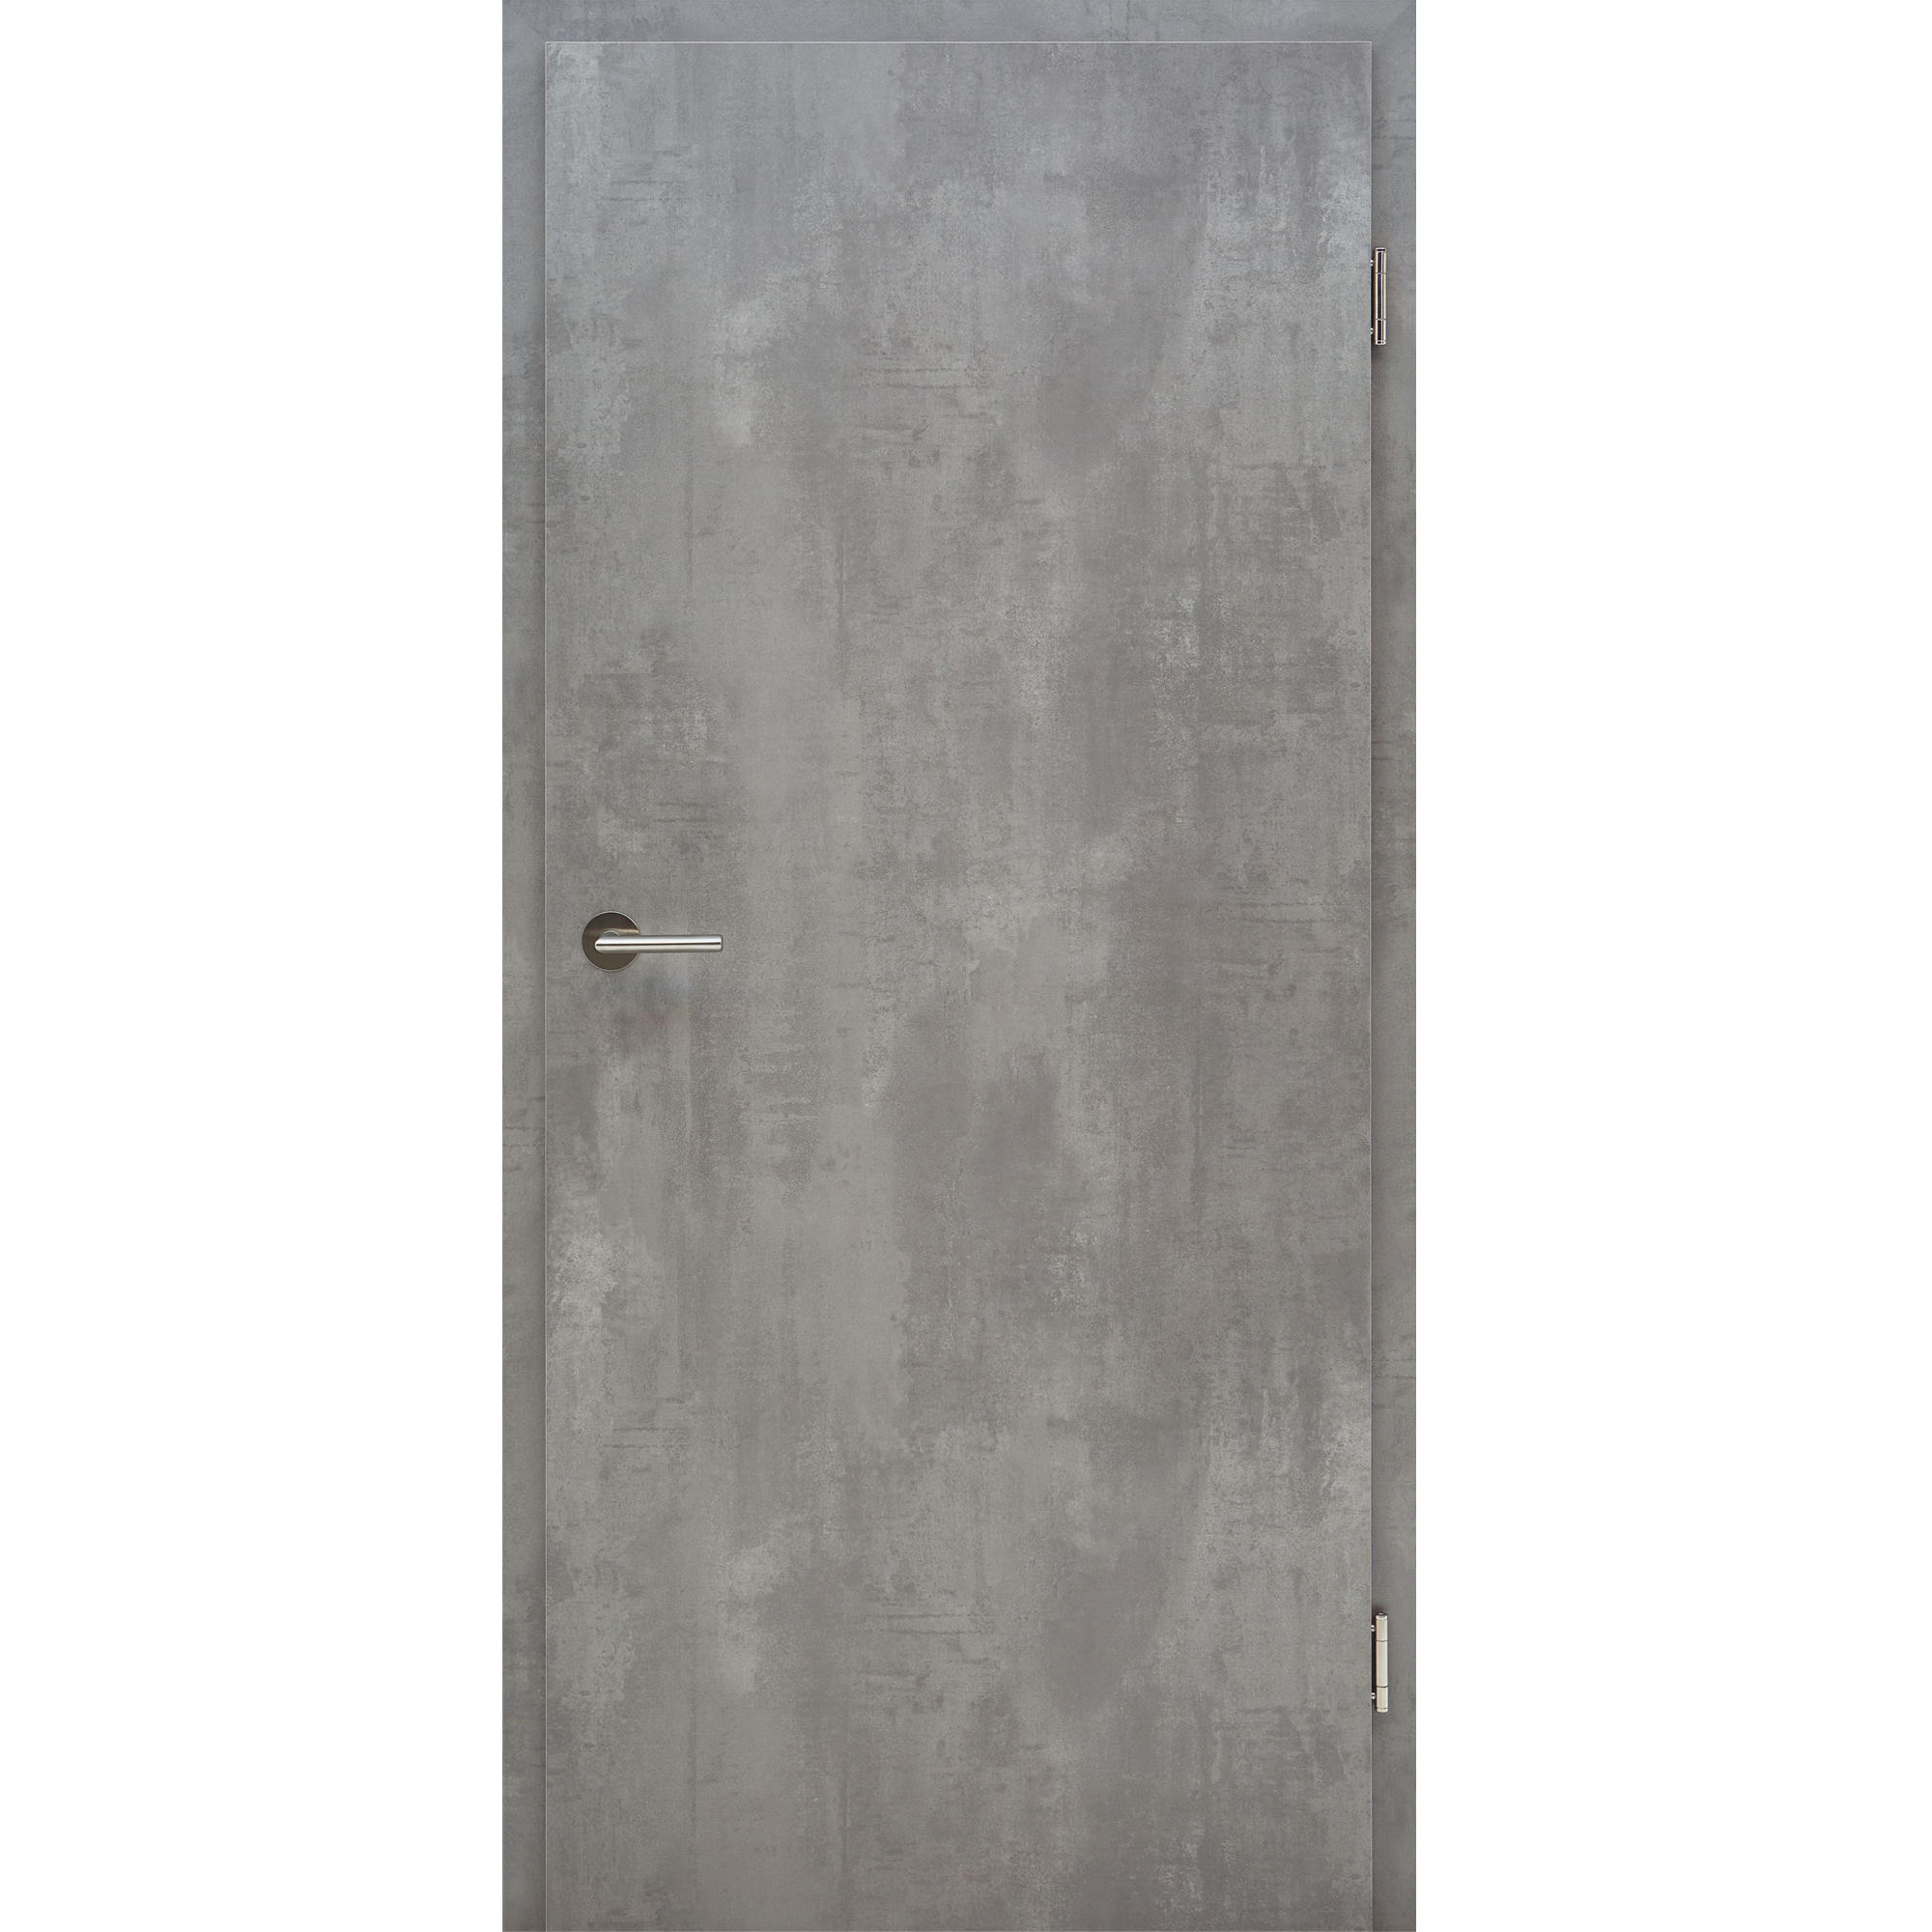 wohnungst r mit zarge cpl concrete vollspan kkl ii 27db eckkante kp holz shop haust ren. Black Bedroom Furniture Sets. Home Design Ideas